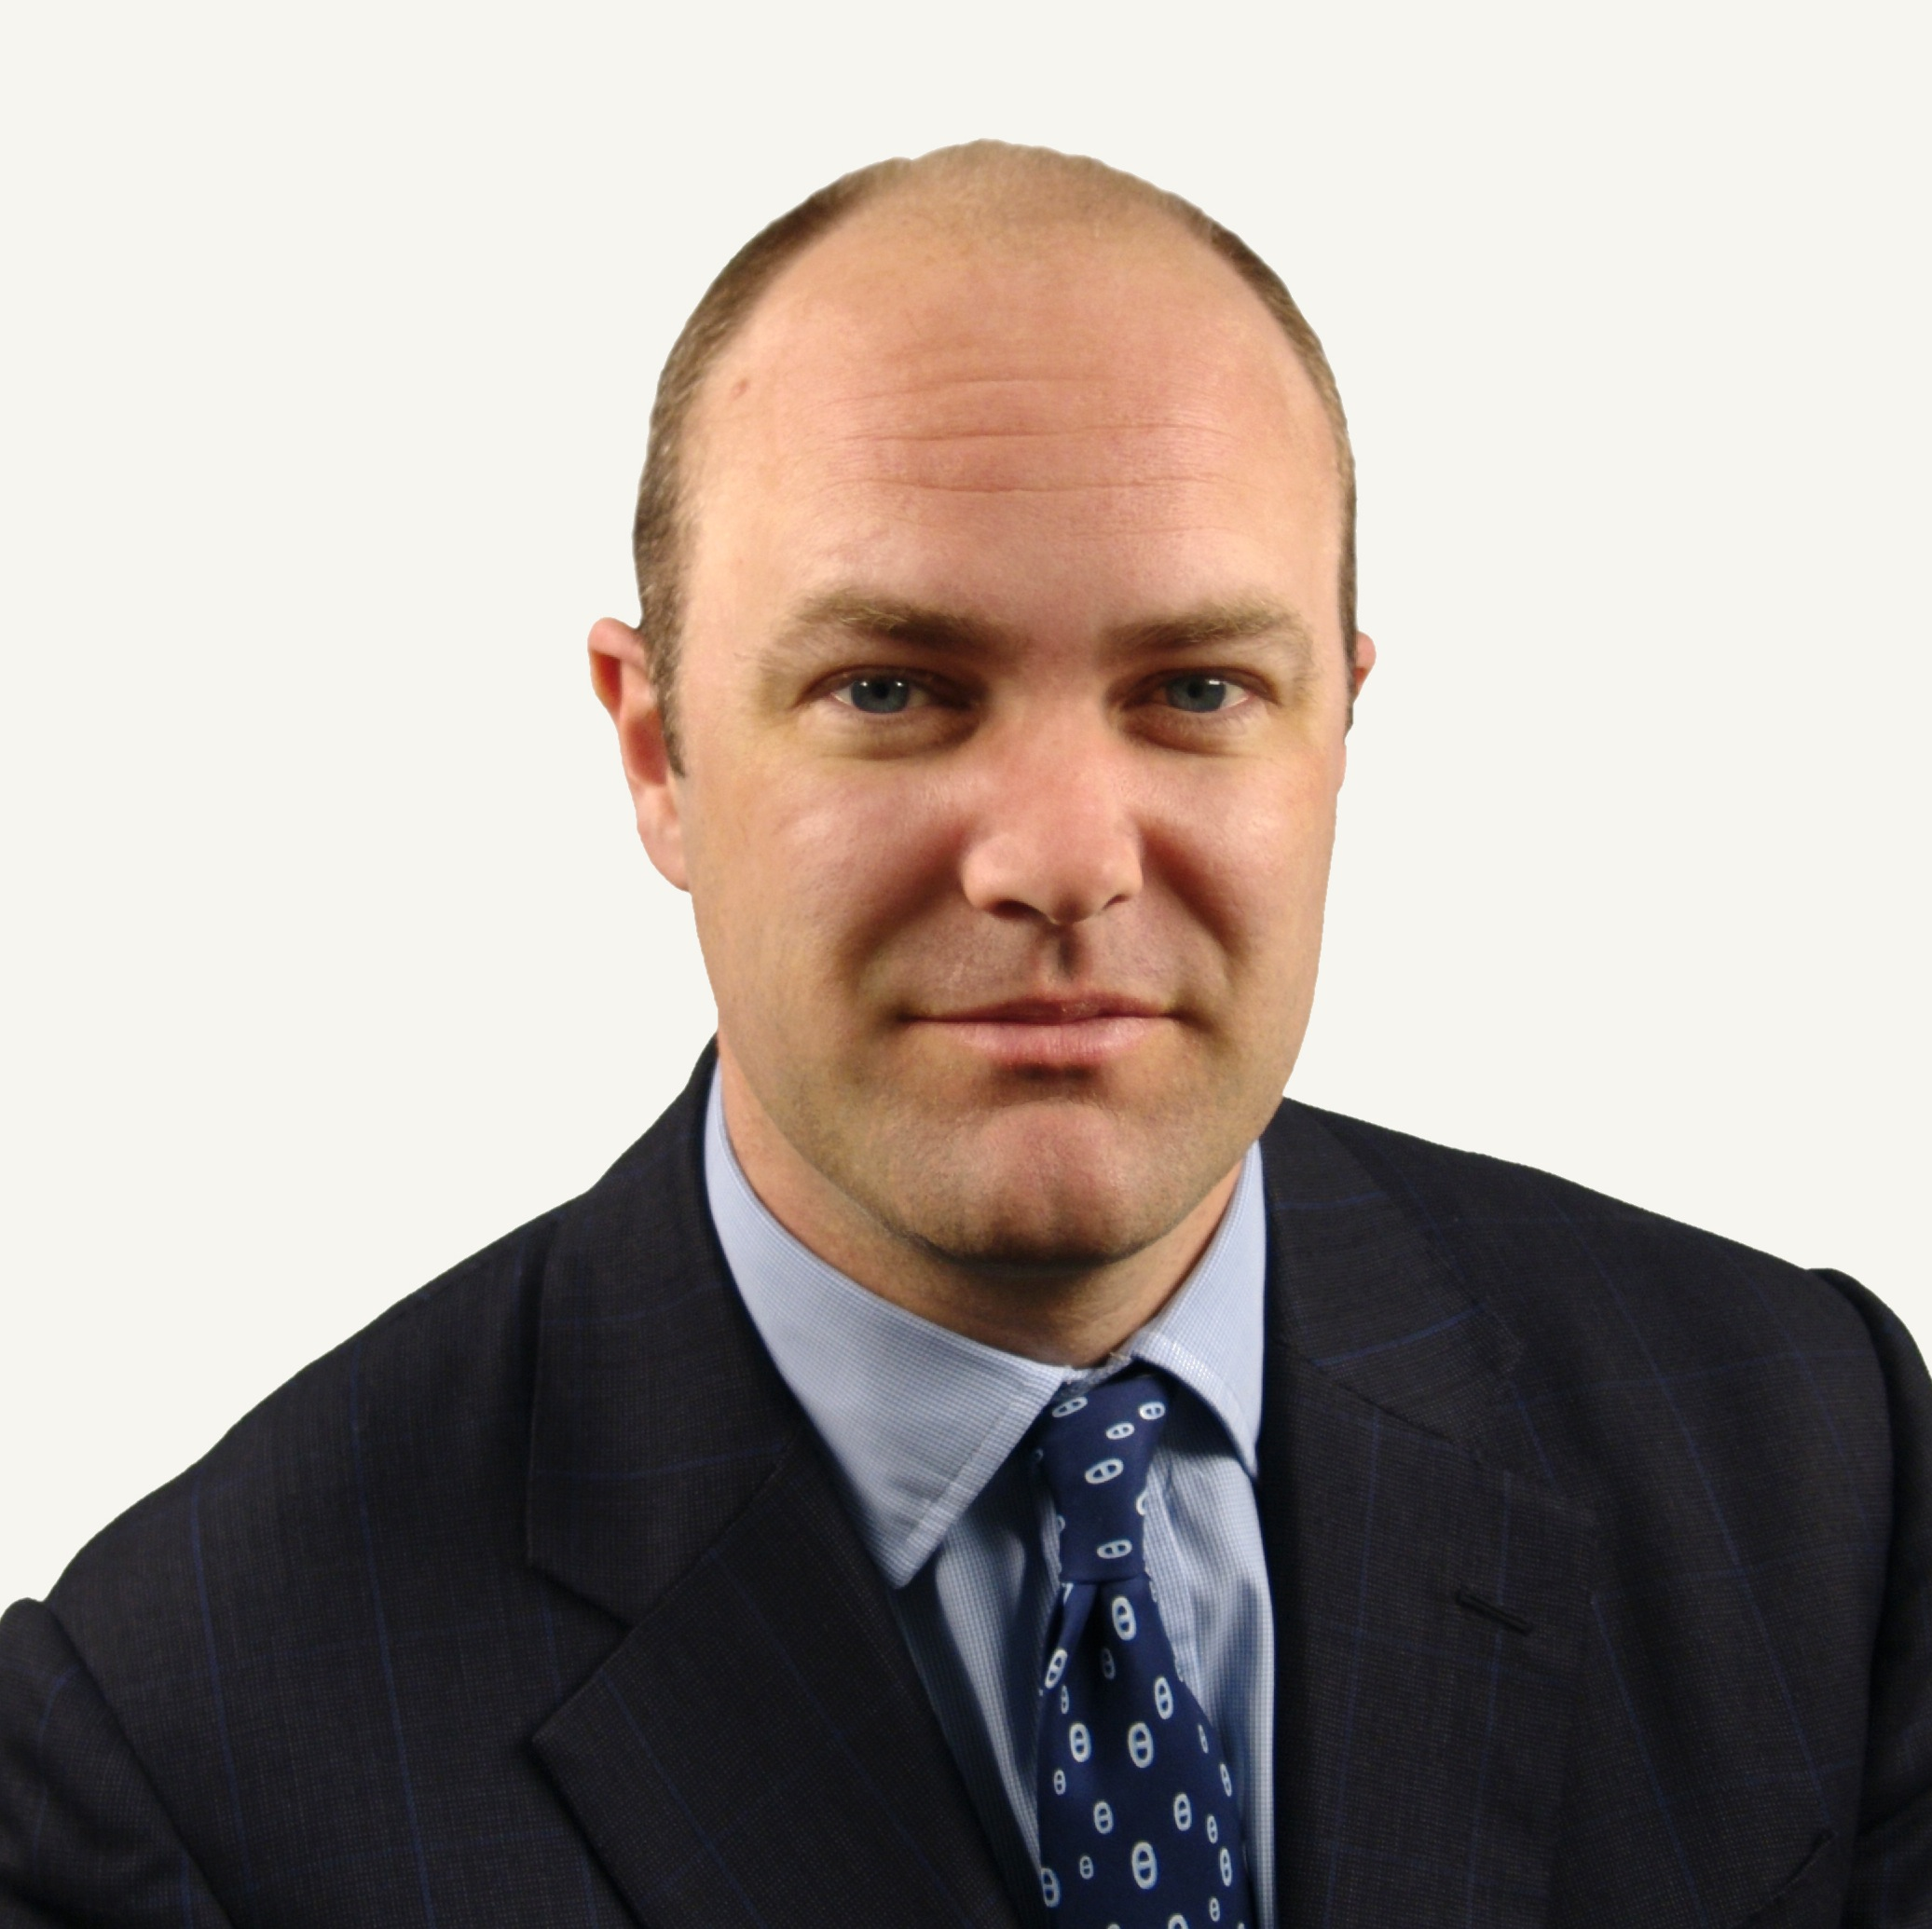 Charles Lindsay